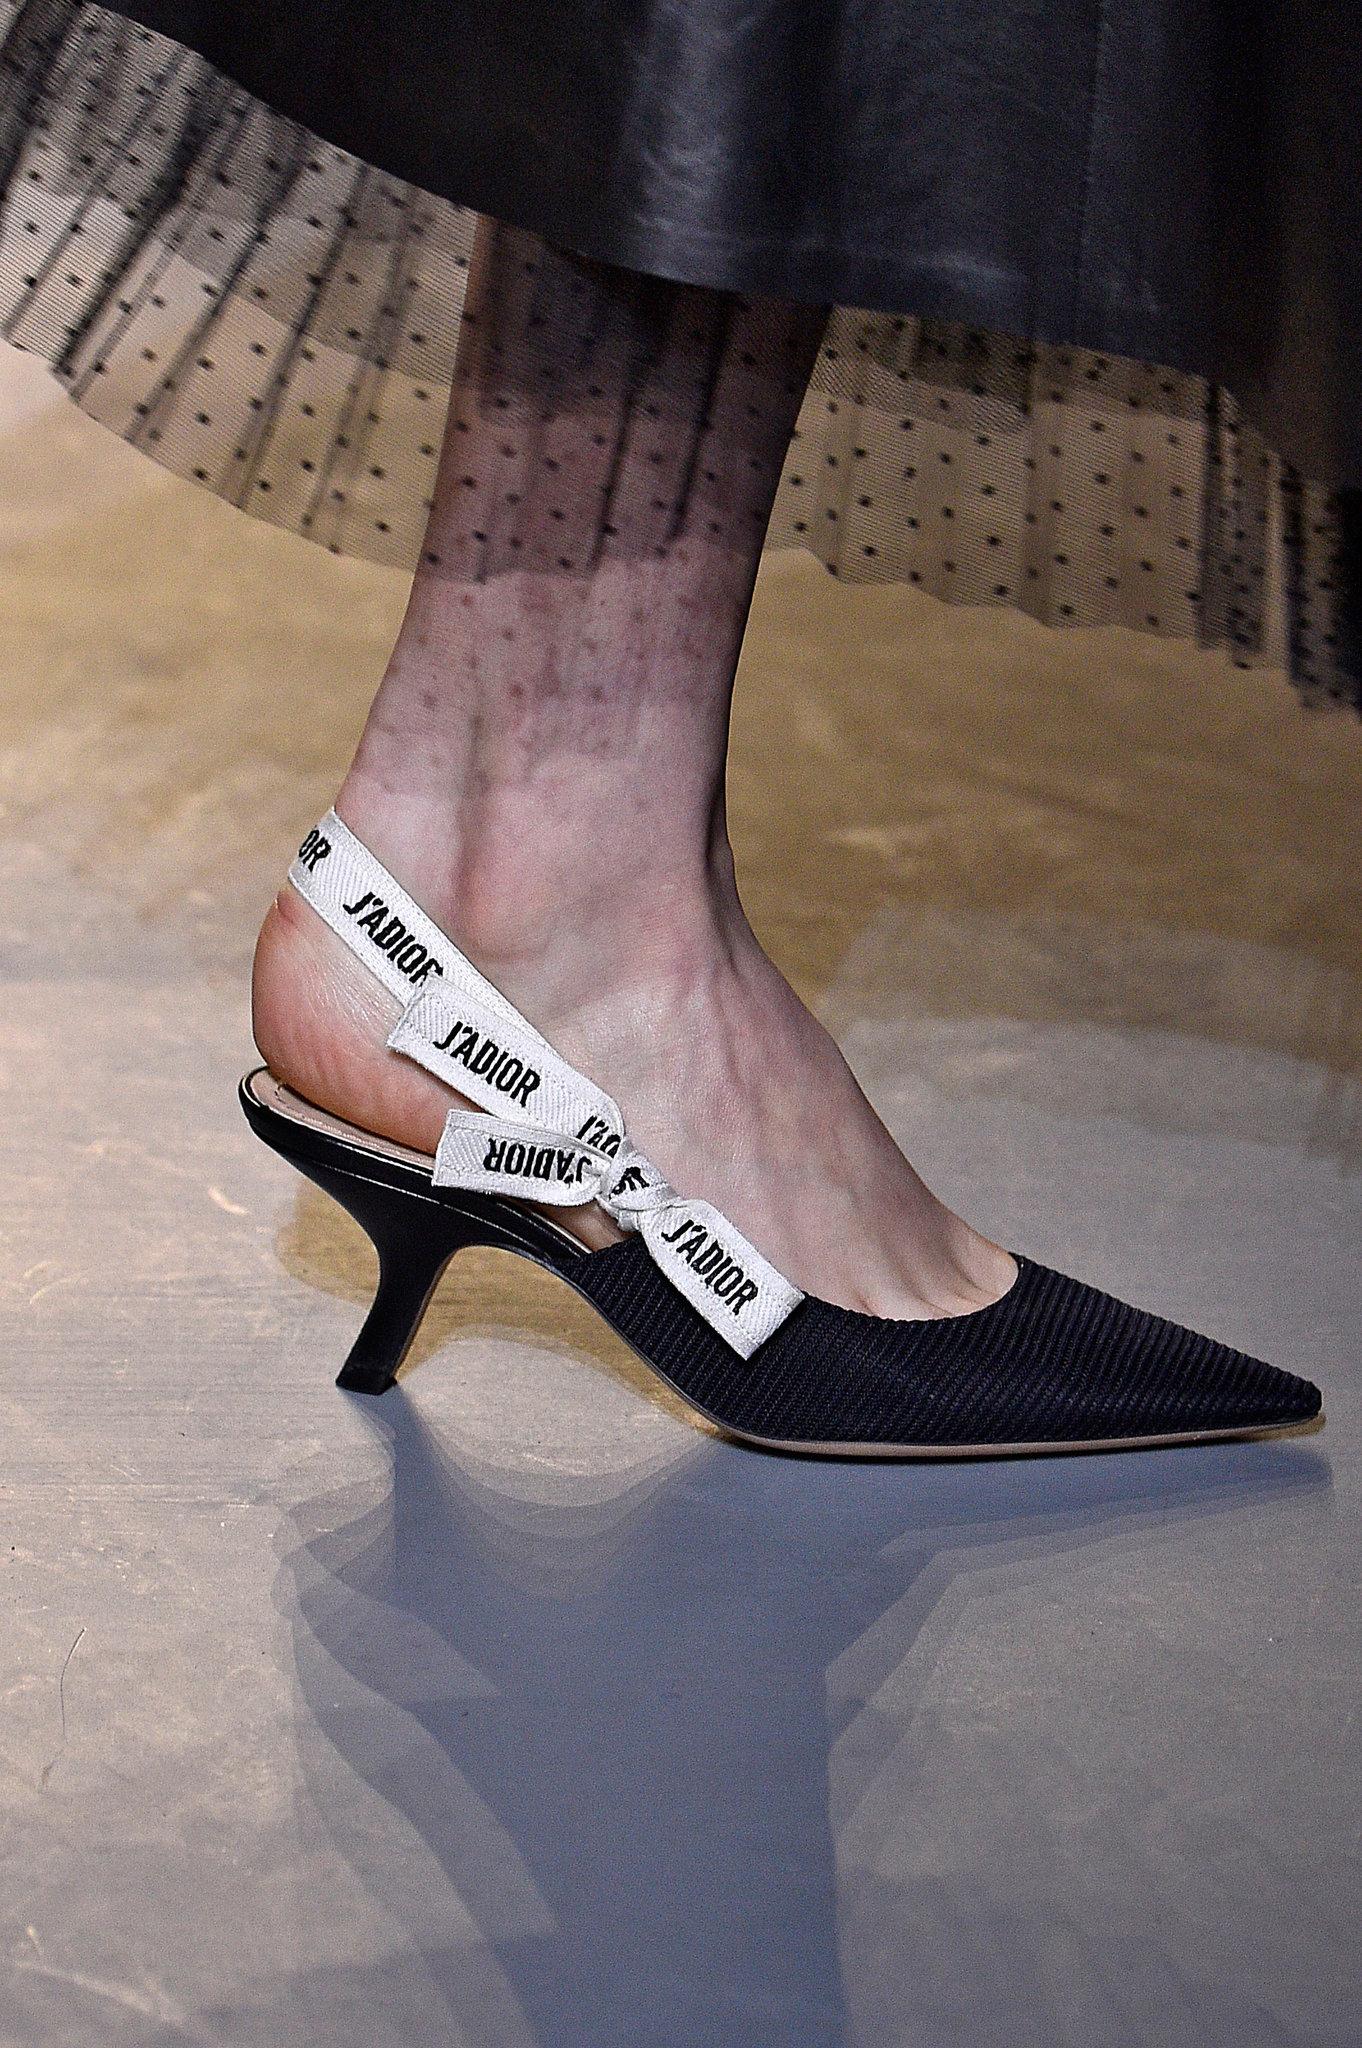 High Street Version Of The Dior Sling Back Kitten Heels